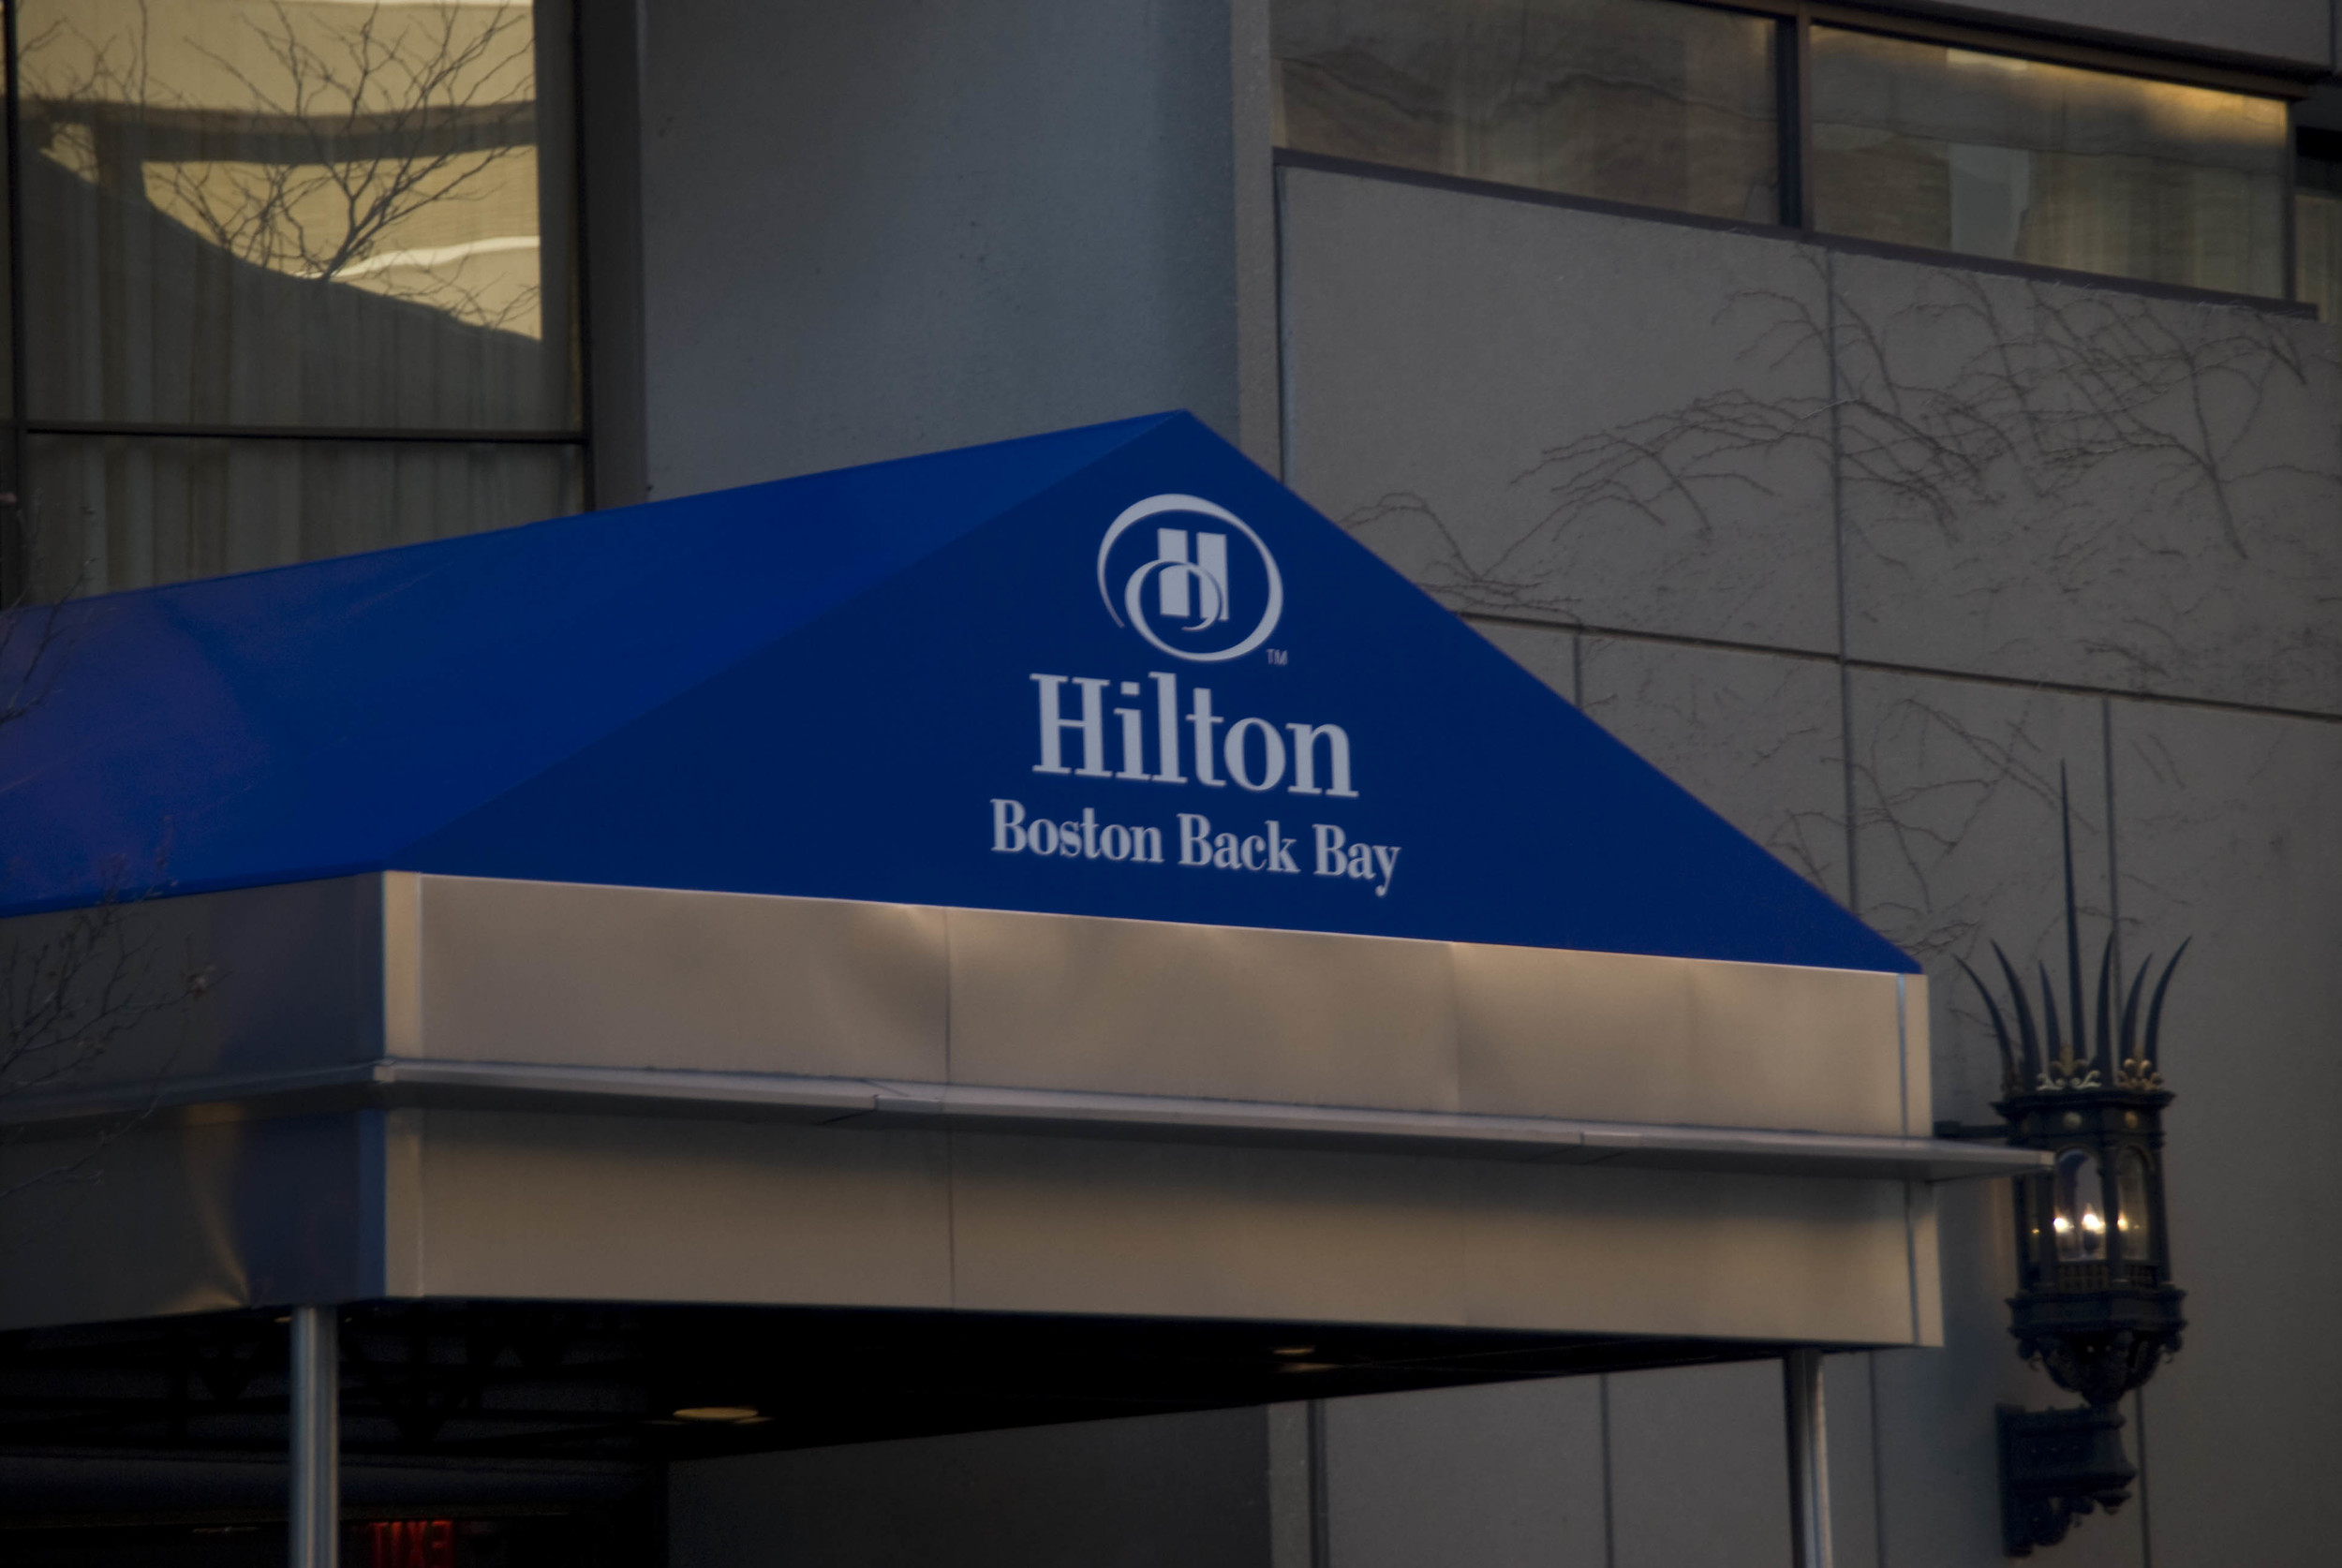 HILTON_7_WEBSITE.jpg